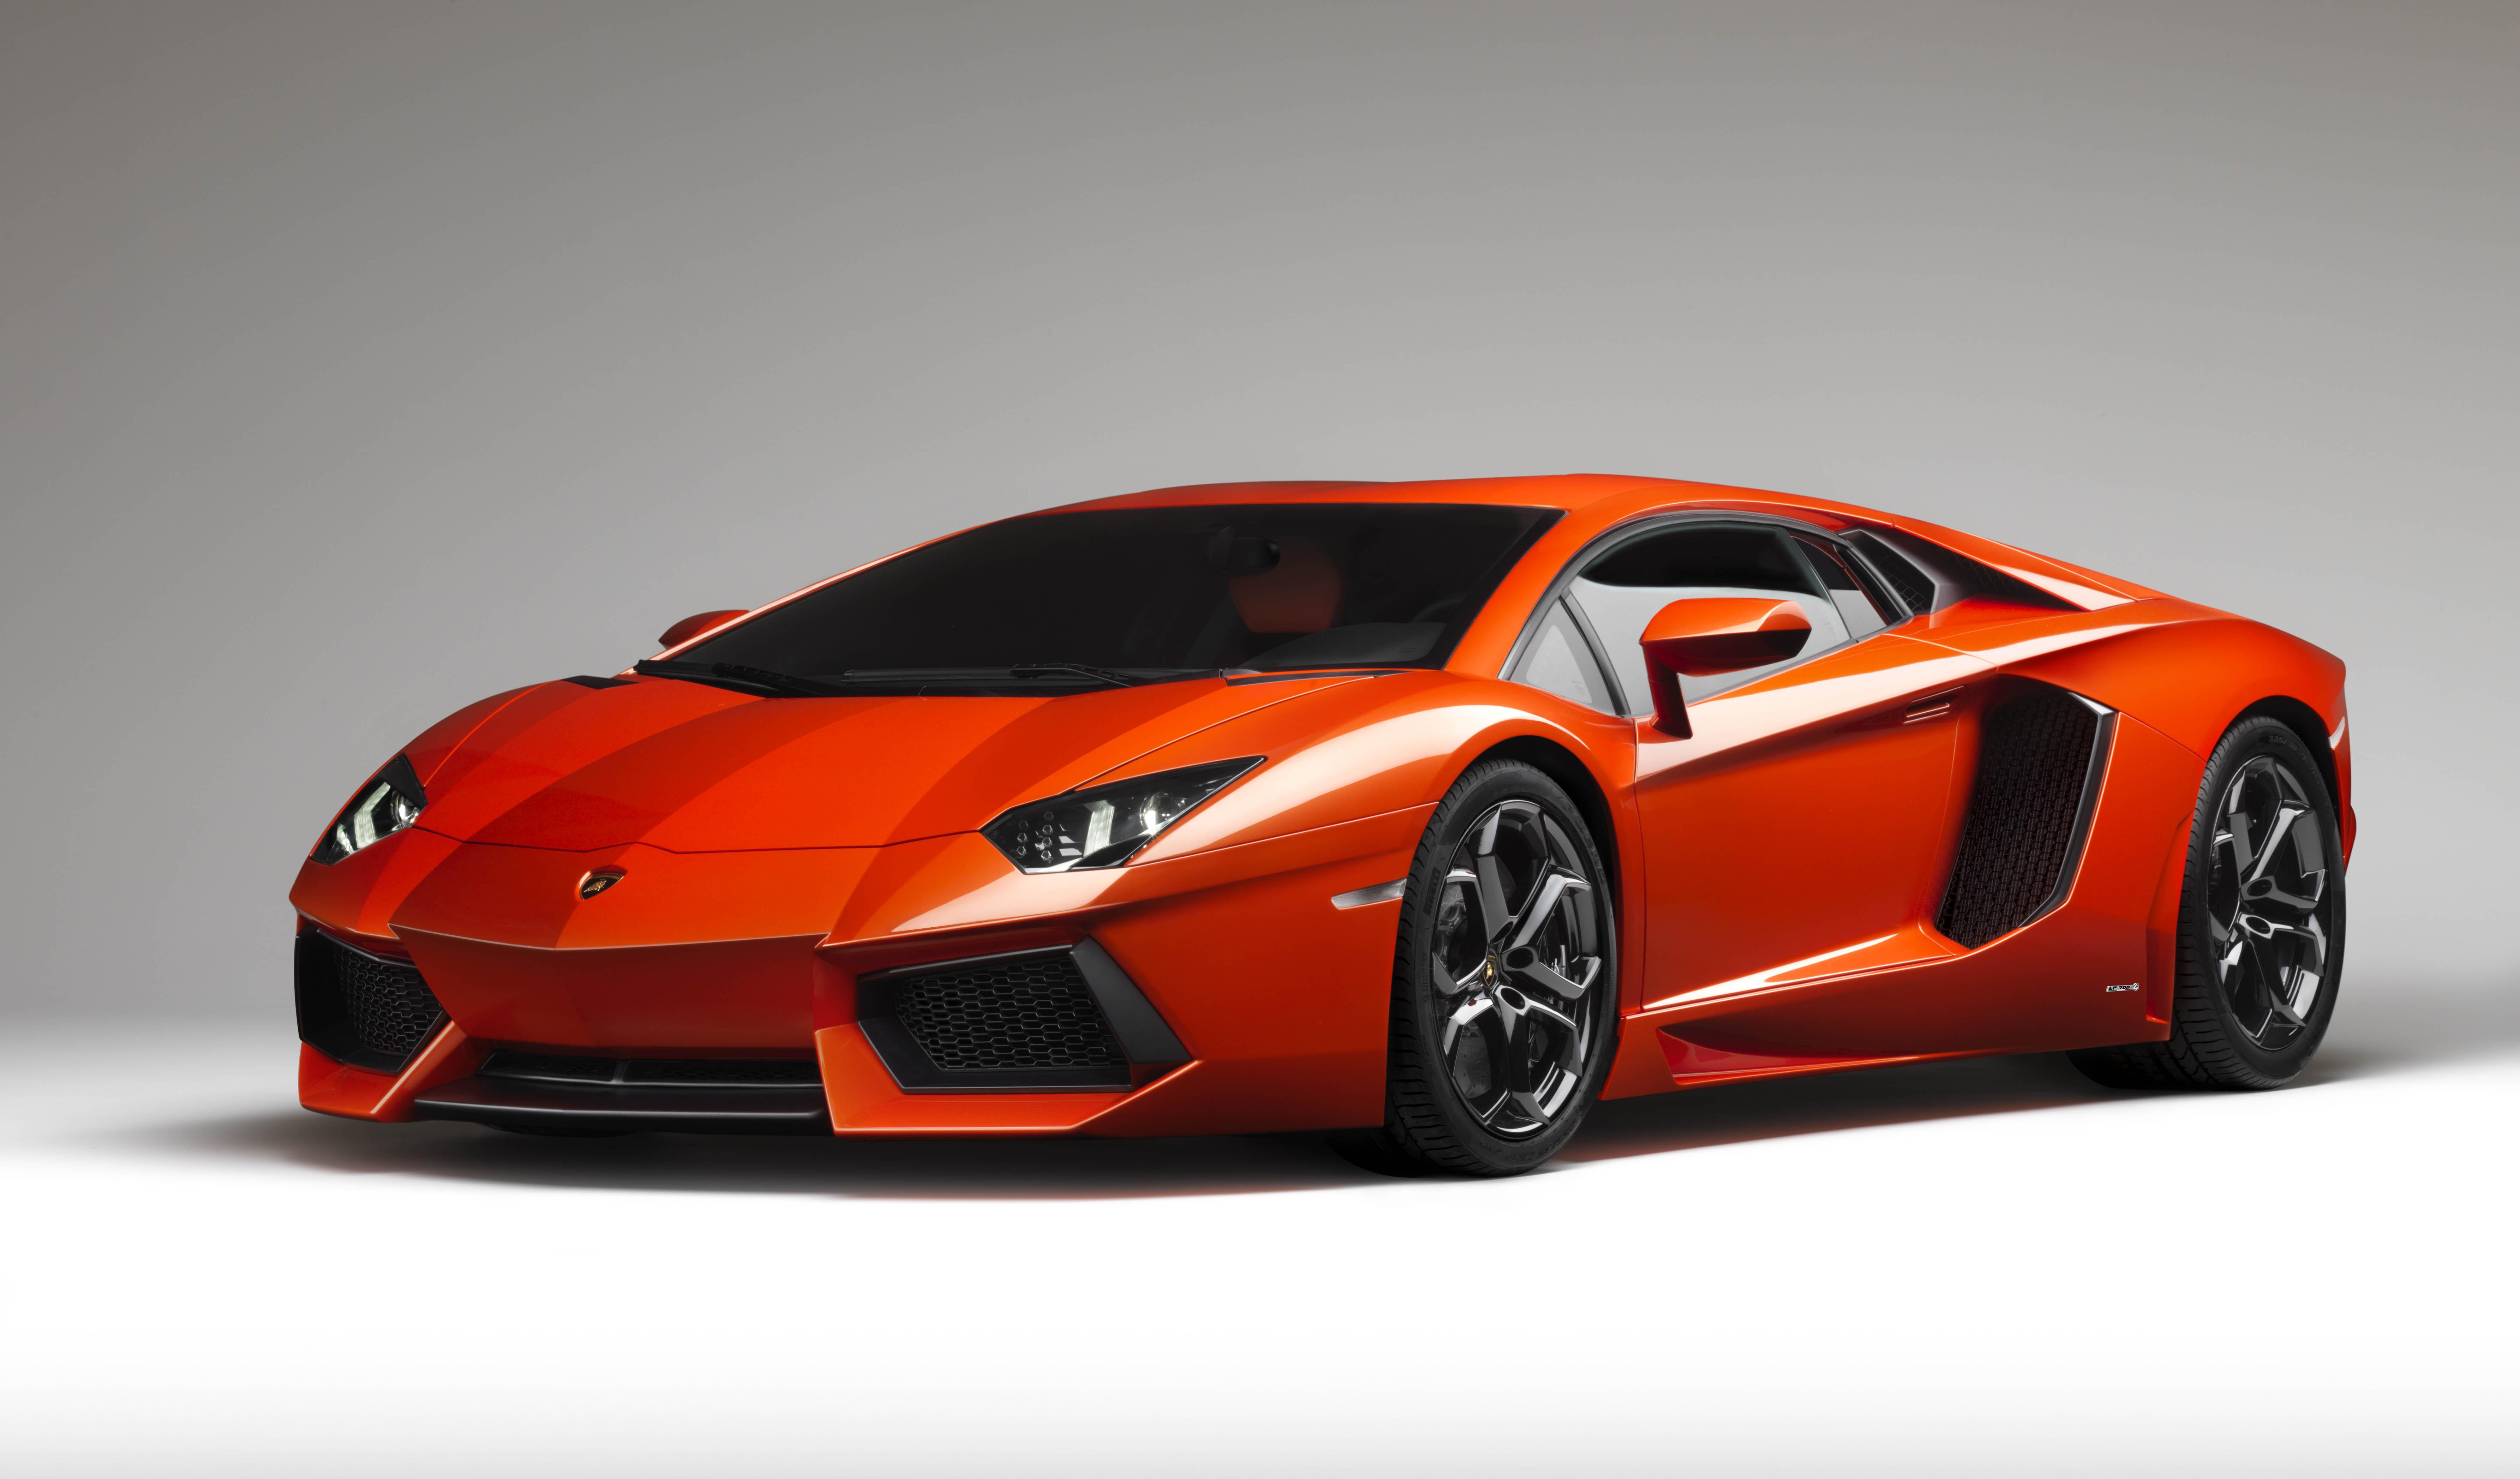 Wallpaper Lamborghini Aventador Car Red Cars Super Car Vehicle